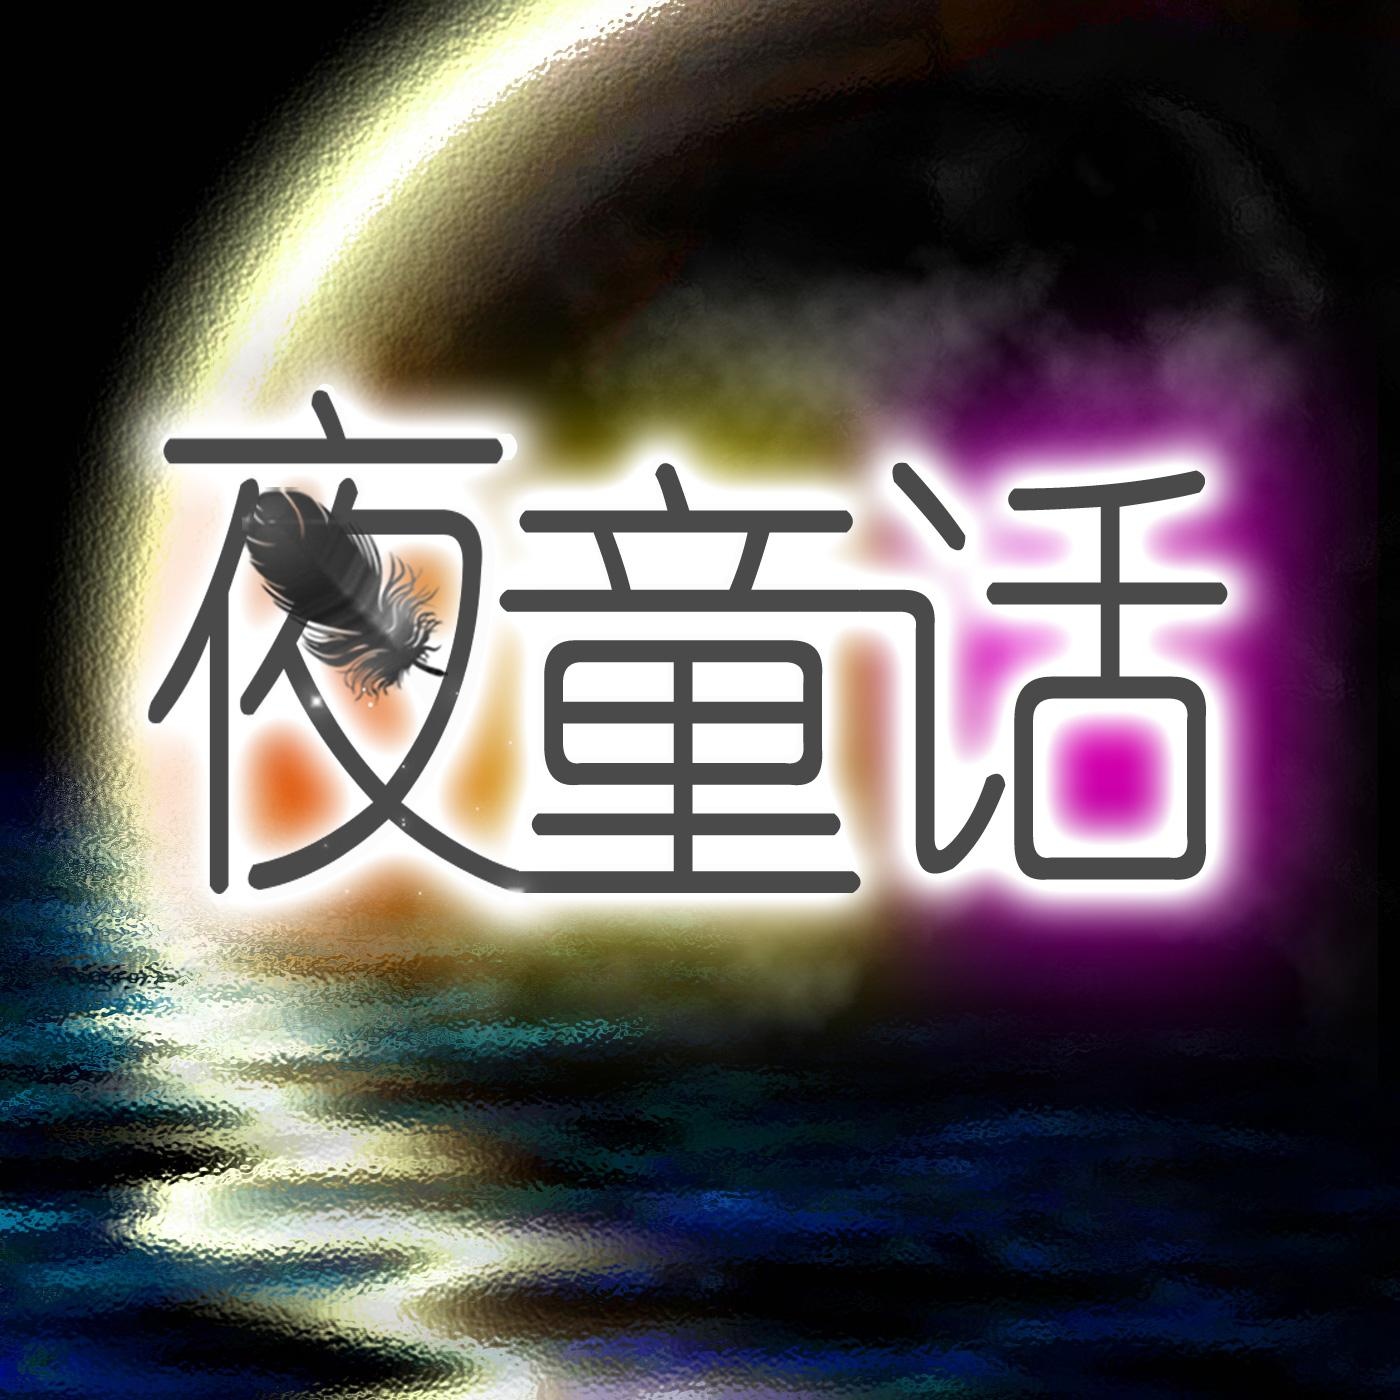 <![CDATA[黑羽夜童话]]>